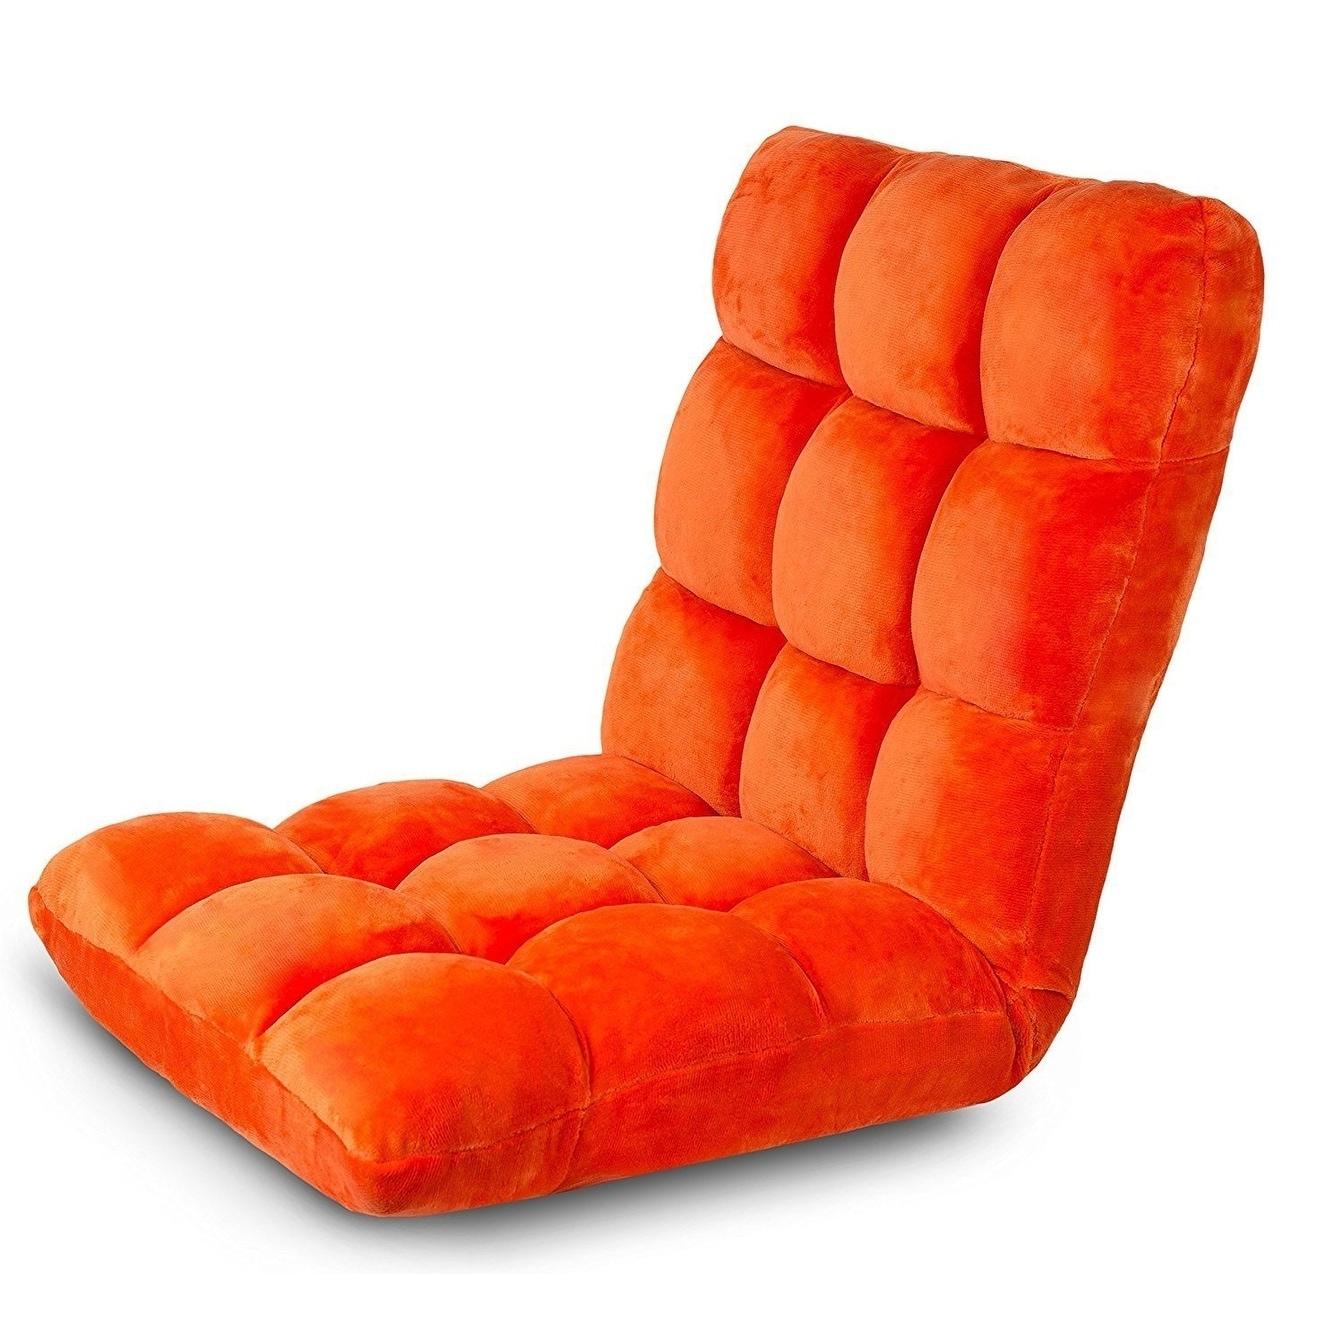 Wondrous Birdrock Home Adjustable 14 Position Memory Foam Floor Chair Gaming Chair Orange Theyellowbook Wood Chair Design Ideas Theyellowbookinfo